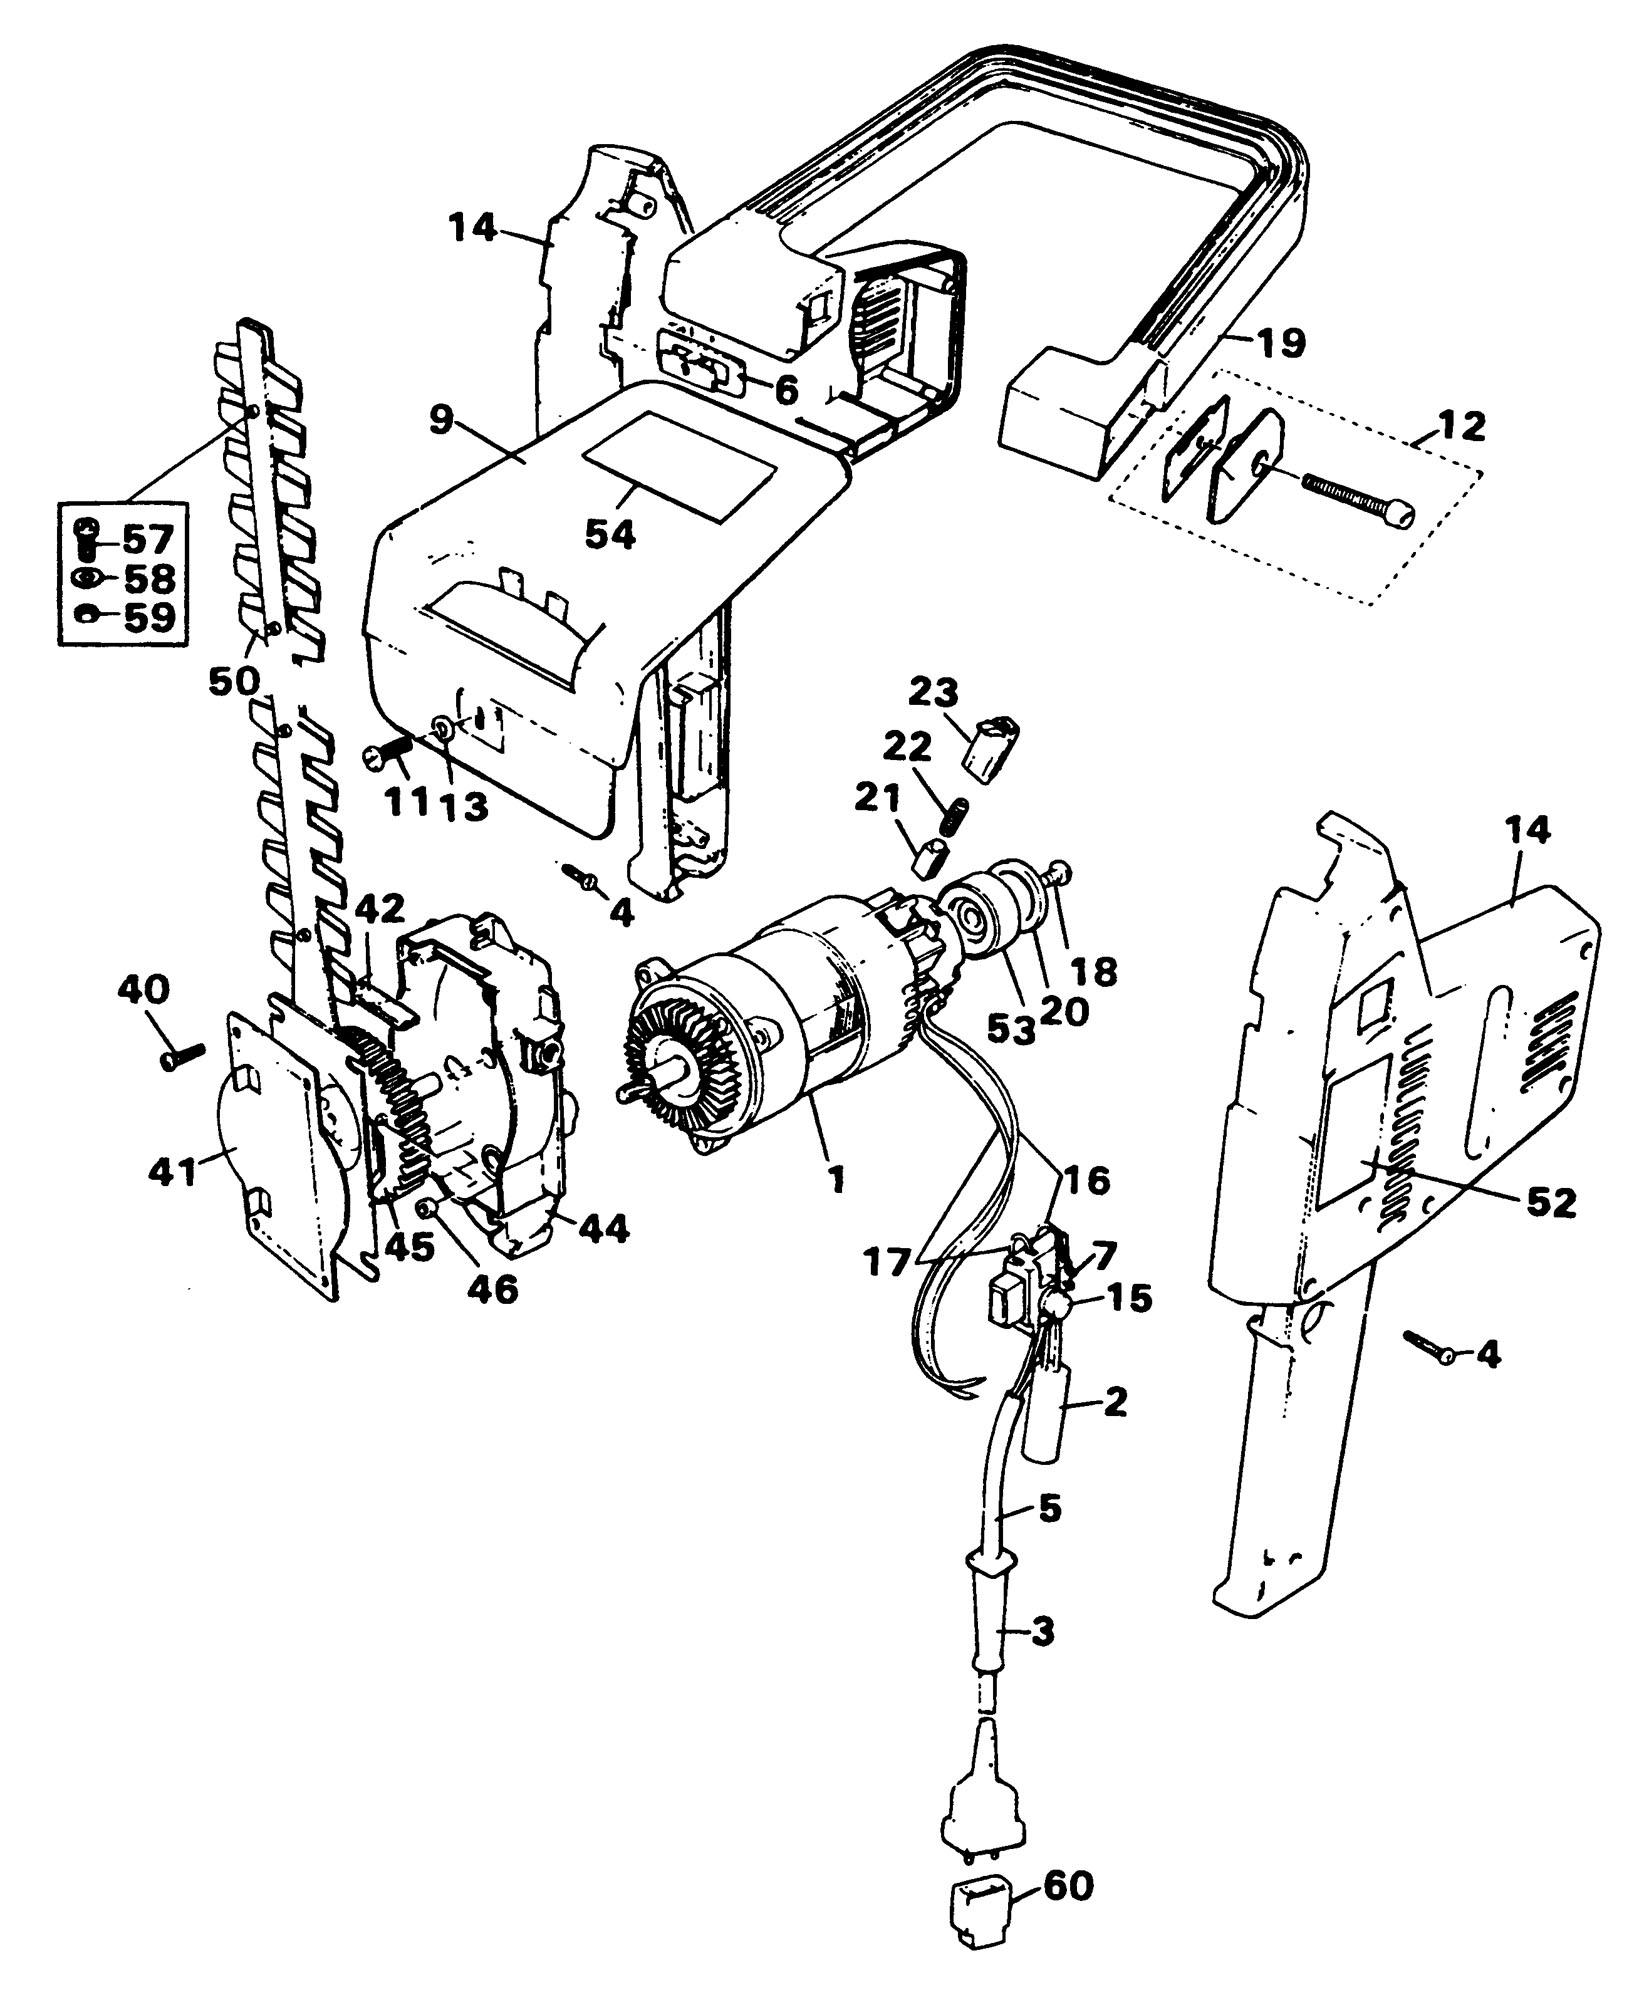 Spares For Black Amp Decker Gc380 Hedgetrimmer Type H1h H4